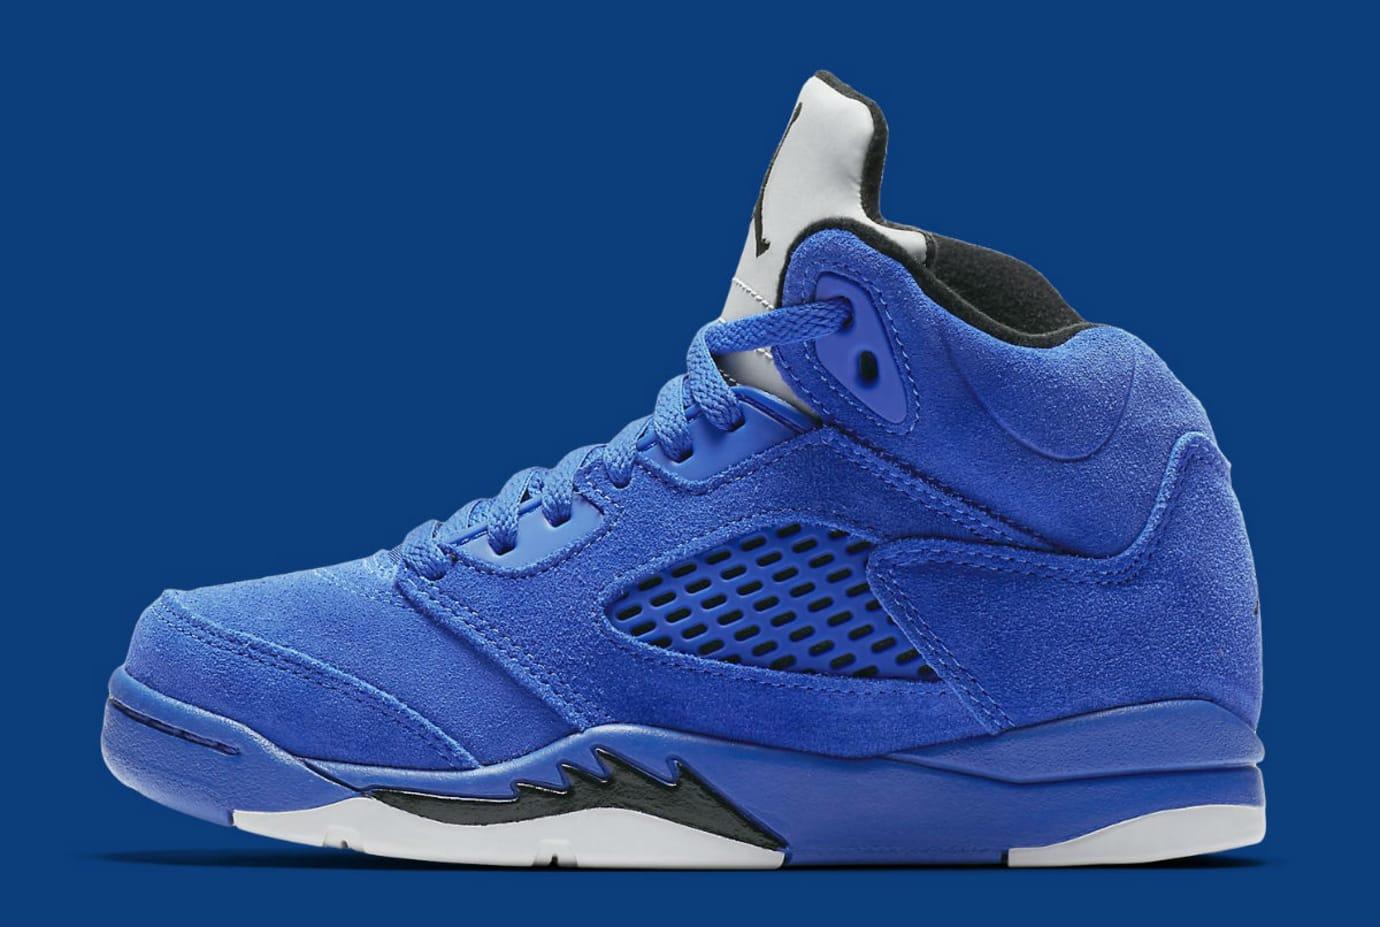 e8f15d4d82ed Air Jordan 5 V Blue Suede Flight Suit Release date Preschool 440889-401